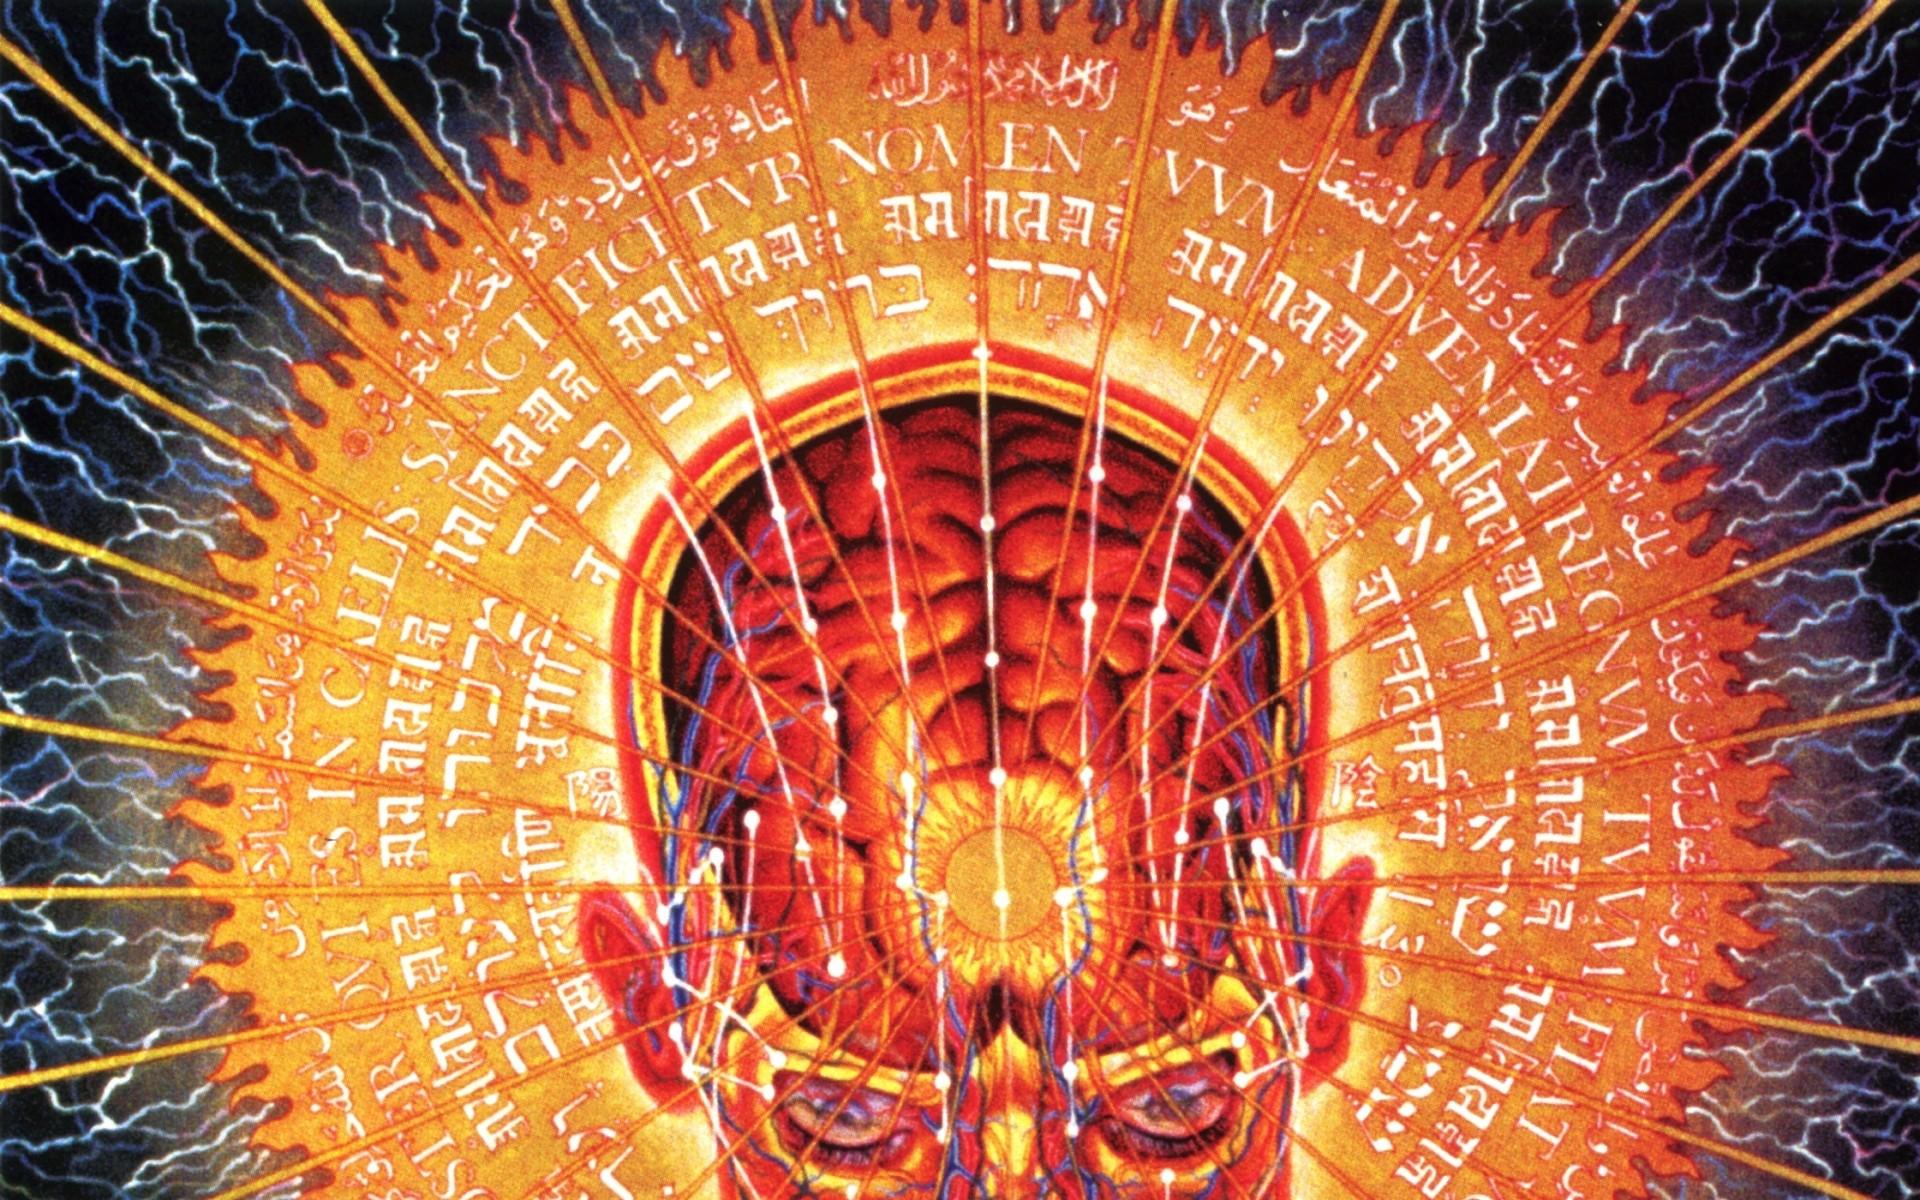 tool anatomy psychedelic third eye 2241×3101 wallpaper Art HD Wallpaper